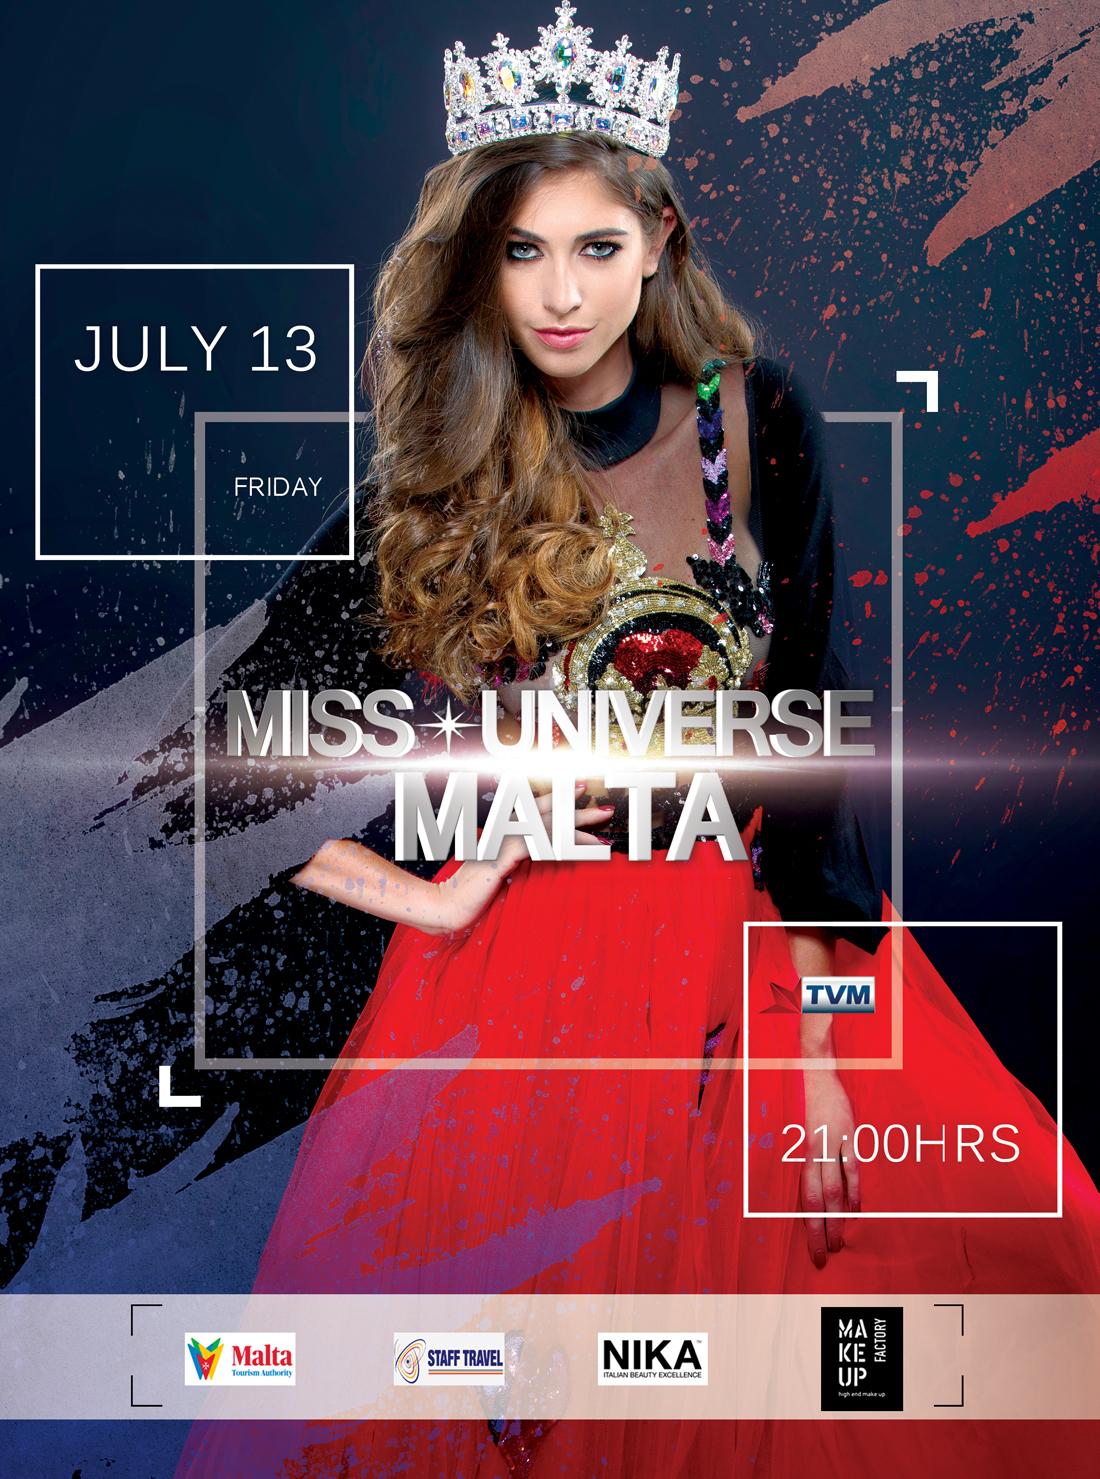 Miss Universe Malta 2018 flyer